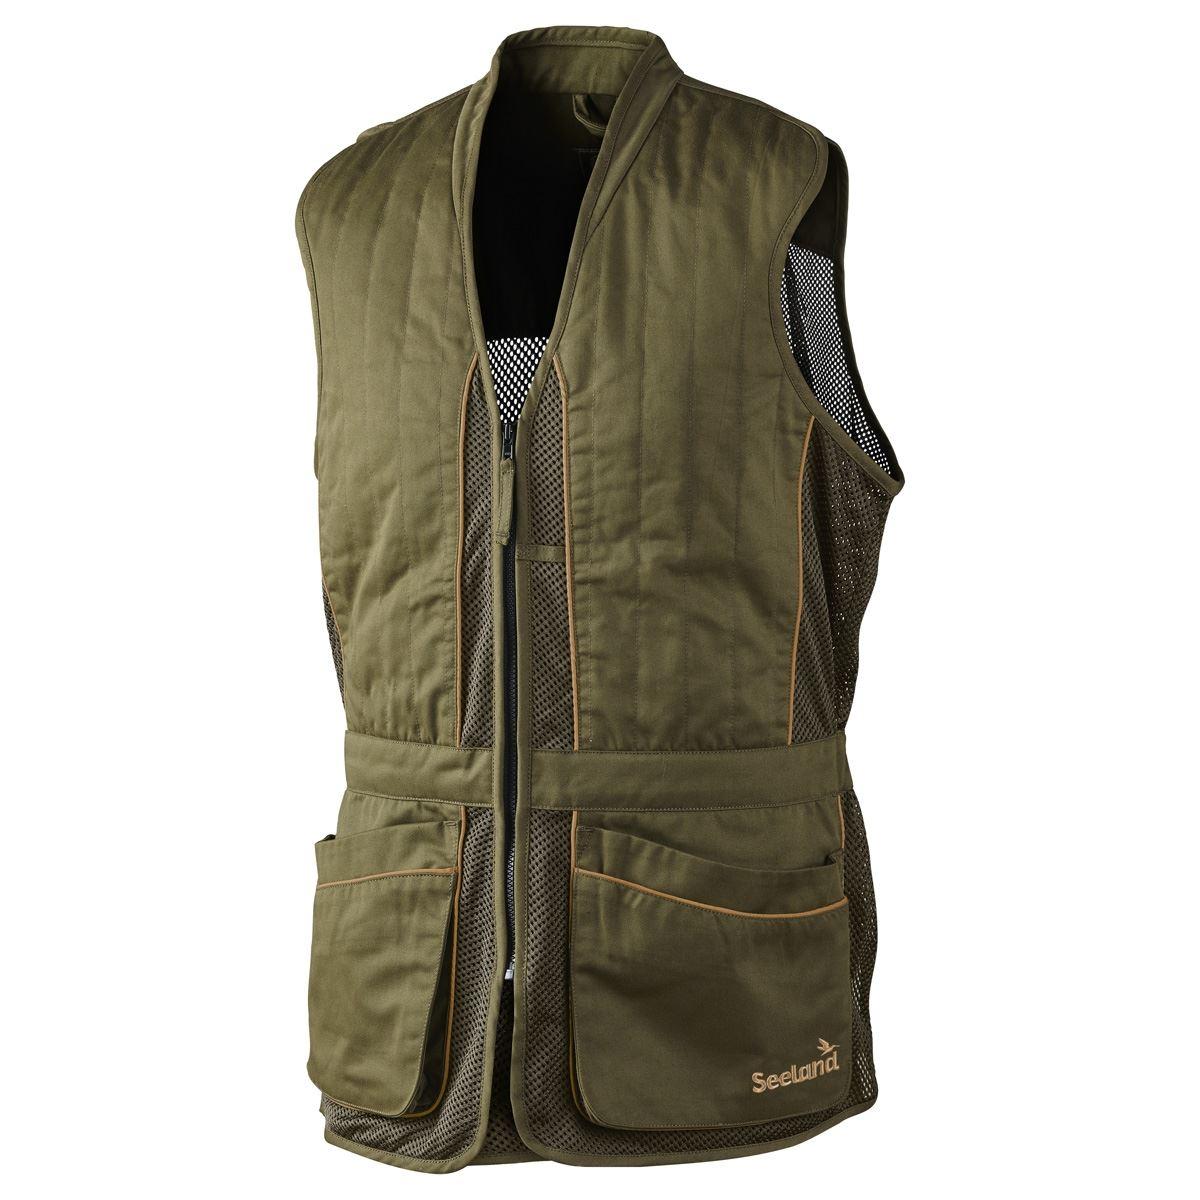 Seeland Skeet Waistcoat Green, Sizes Small to 4XL (Clay Shooting Hunting)